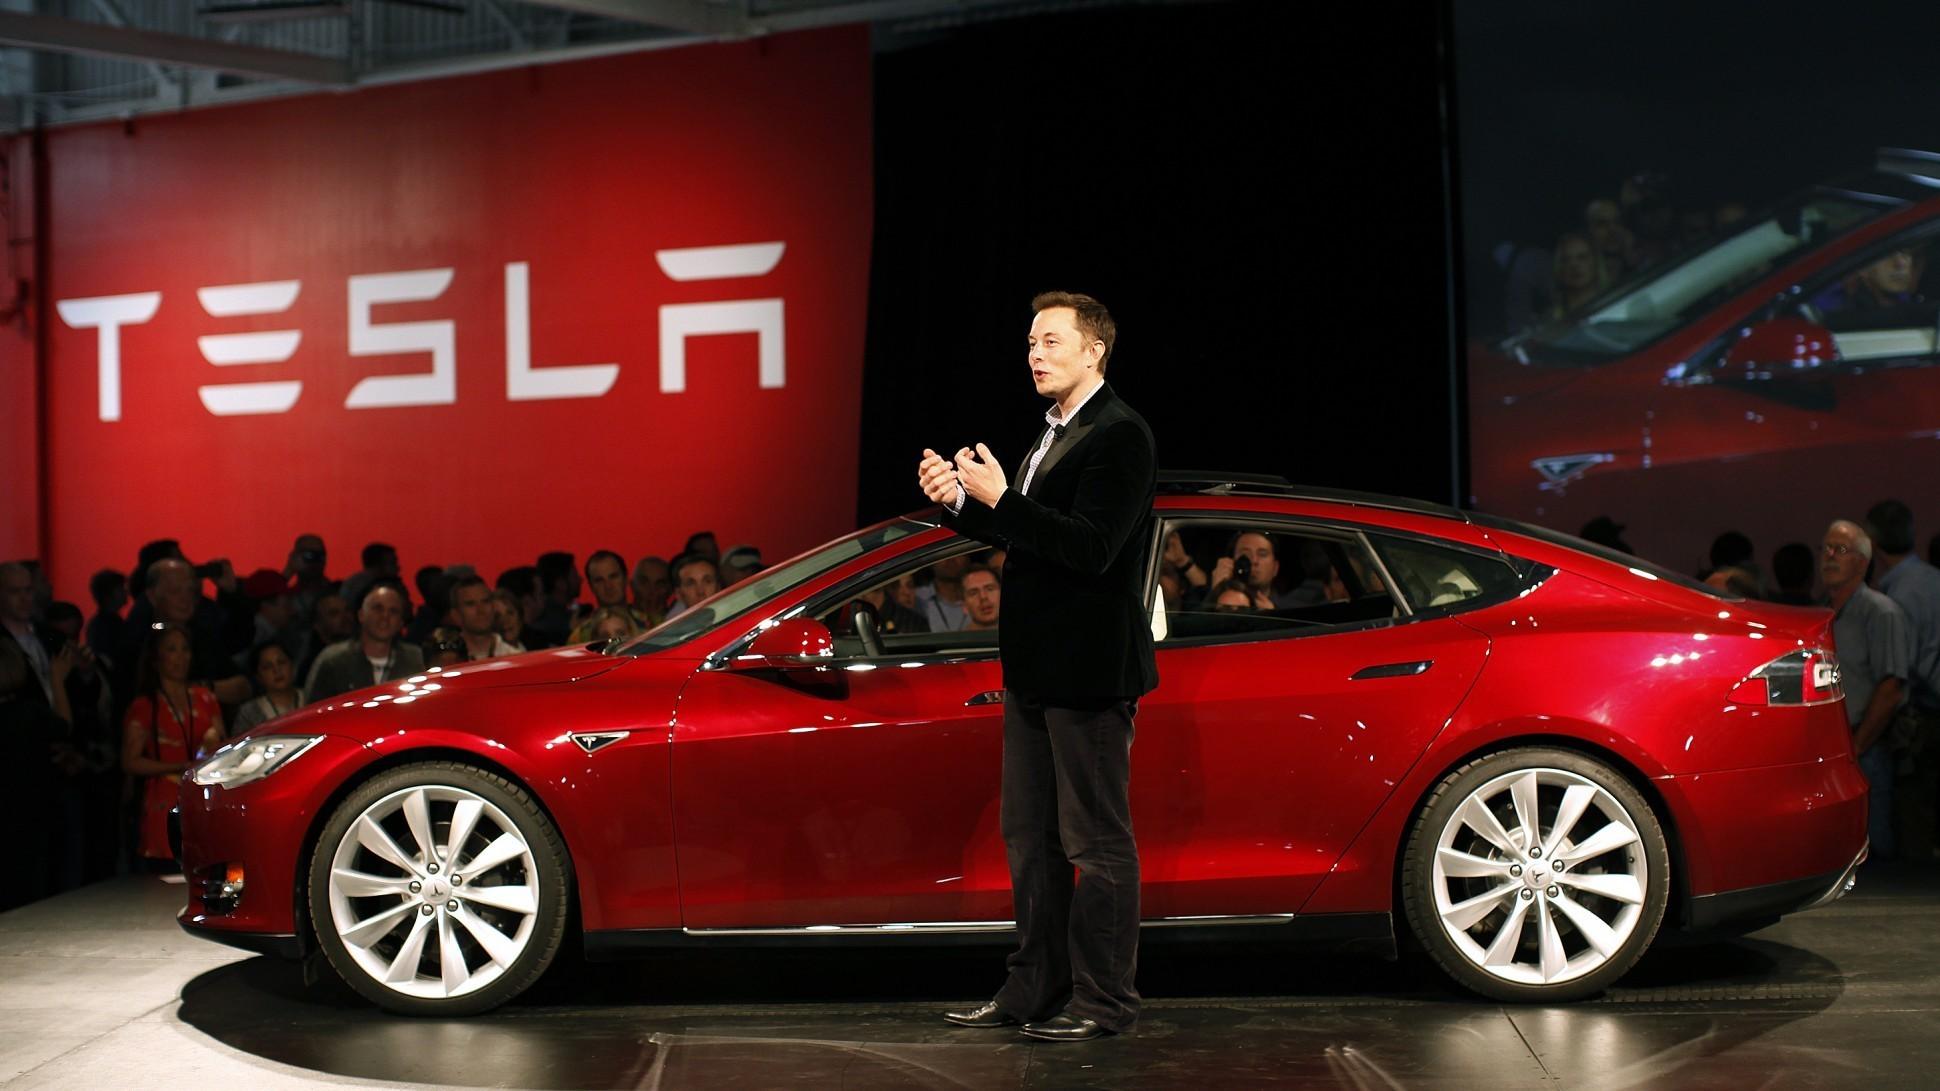 Elon Musk standing next to a Tesla Model S at a Press Event.